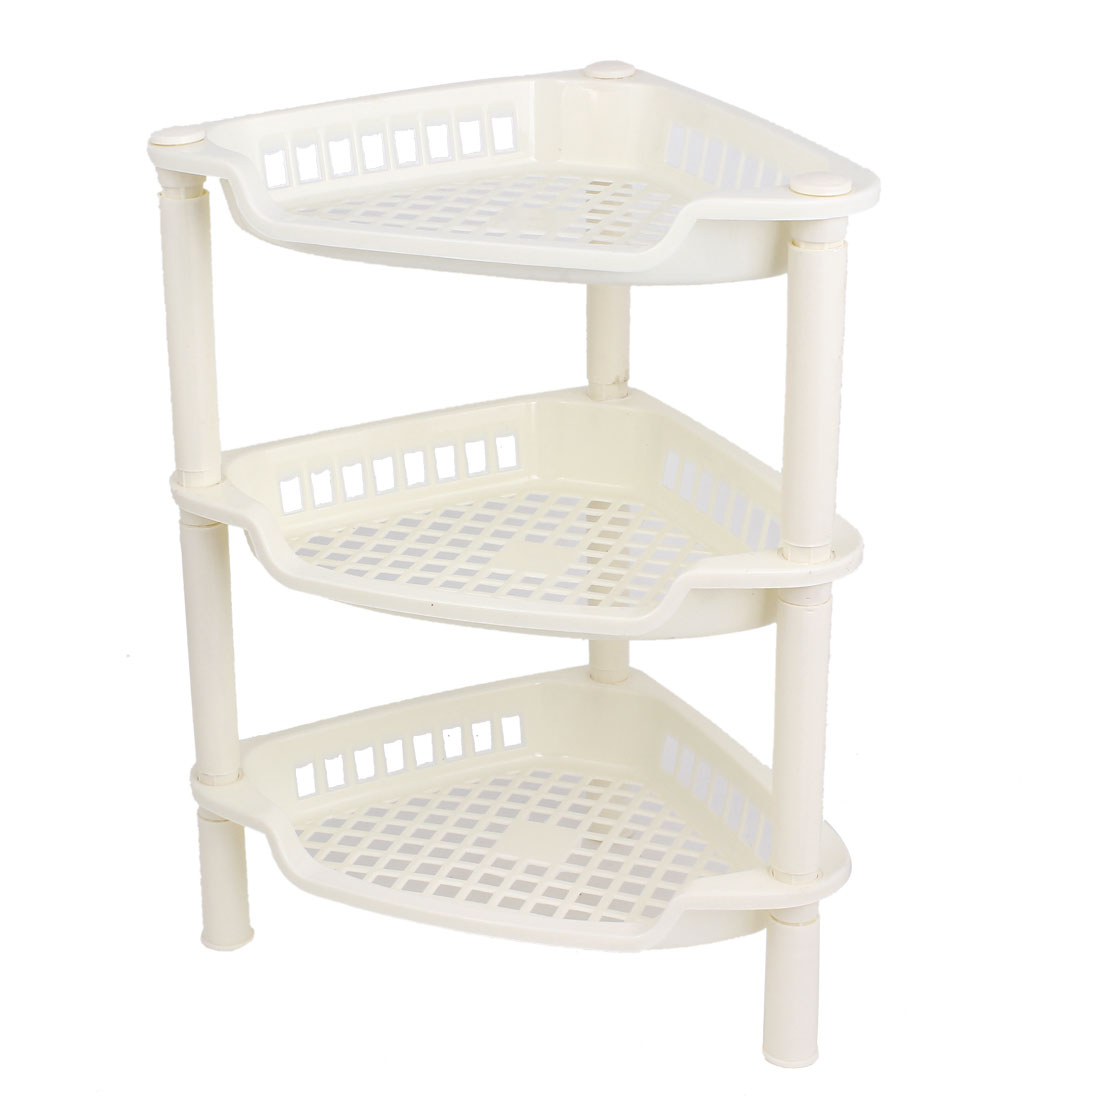 Beige Plastic Mini 3 Layer Shelf Storage Rack Organizer for Home